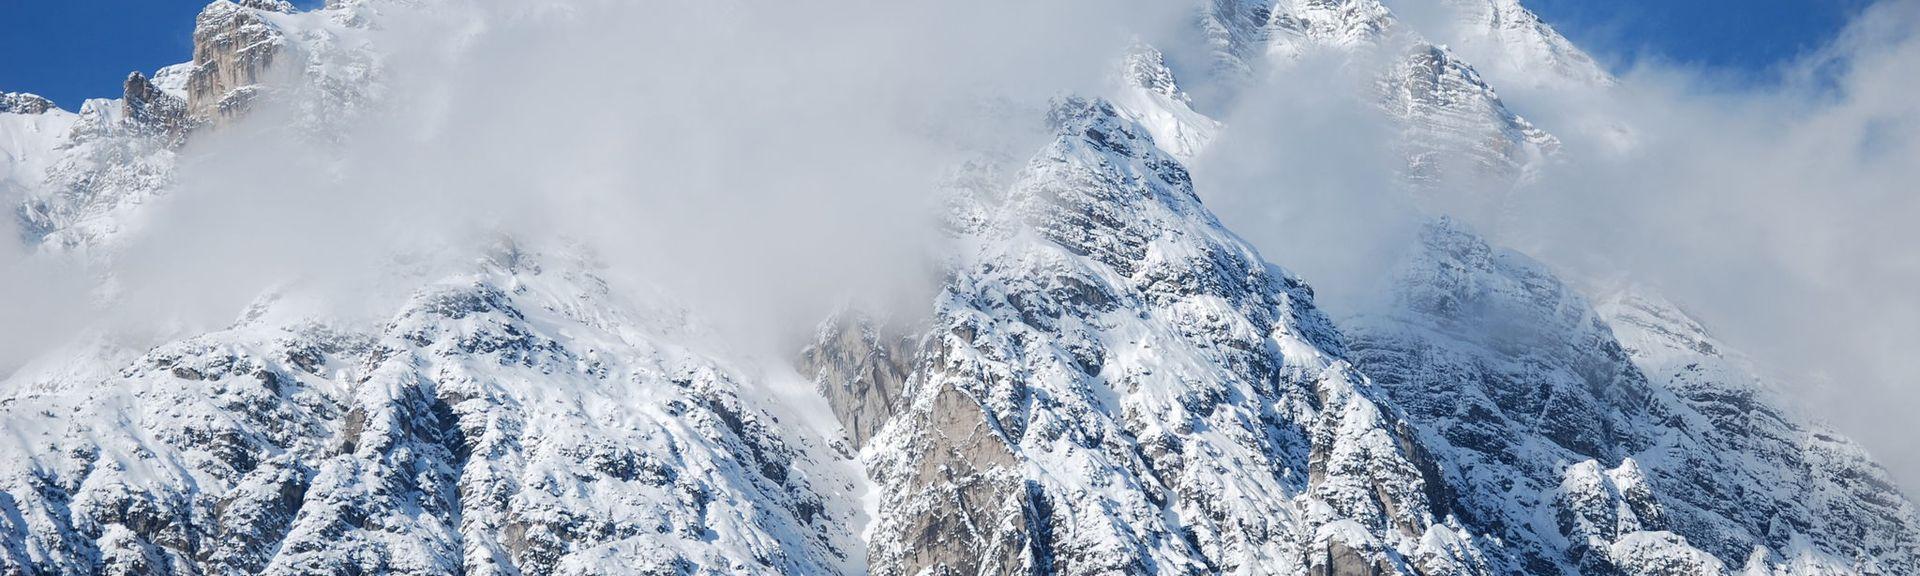 Panorama Badewelt, St. Johann in Tirol, Tirol, Österreich